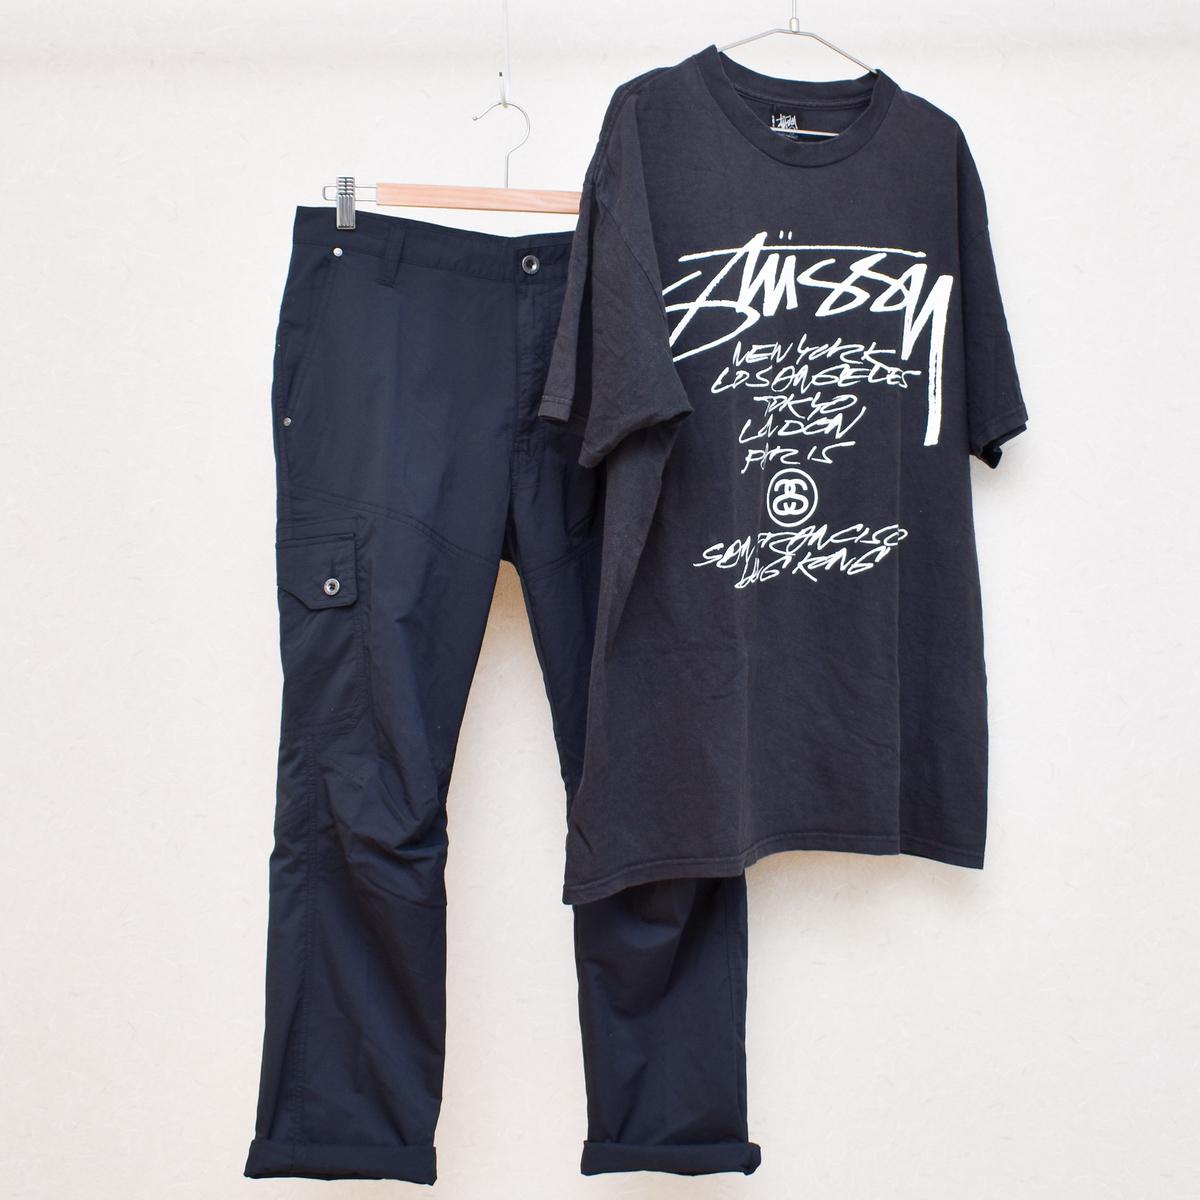 f:id:yamada0221:20190723105847j:plain